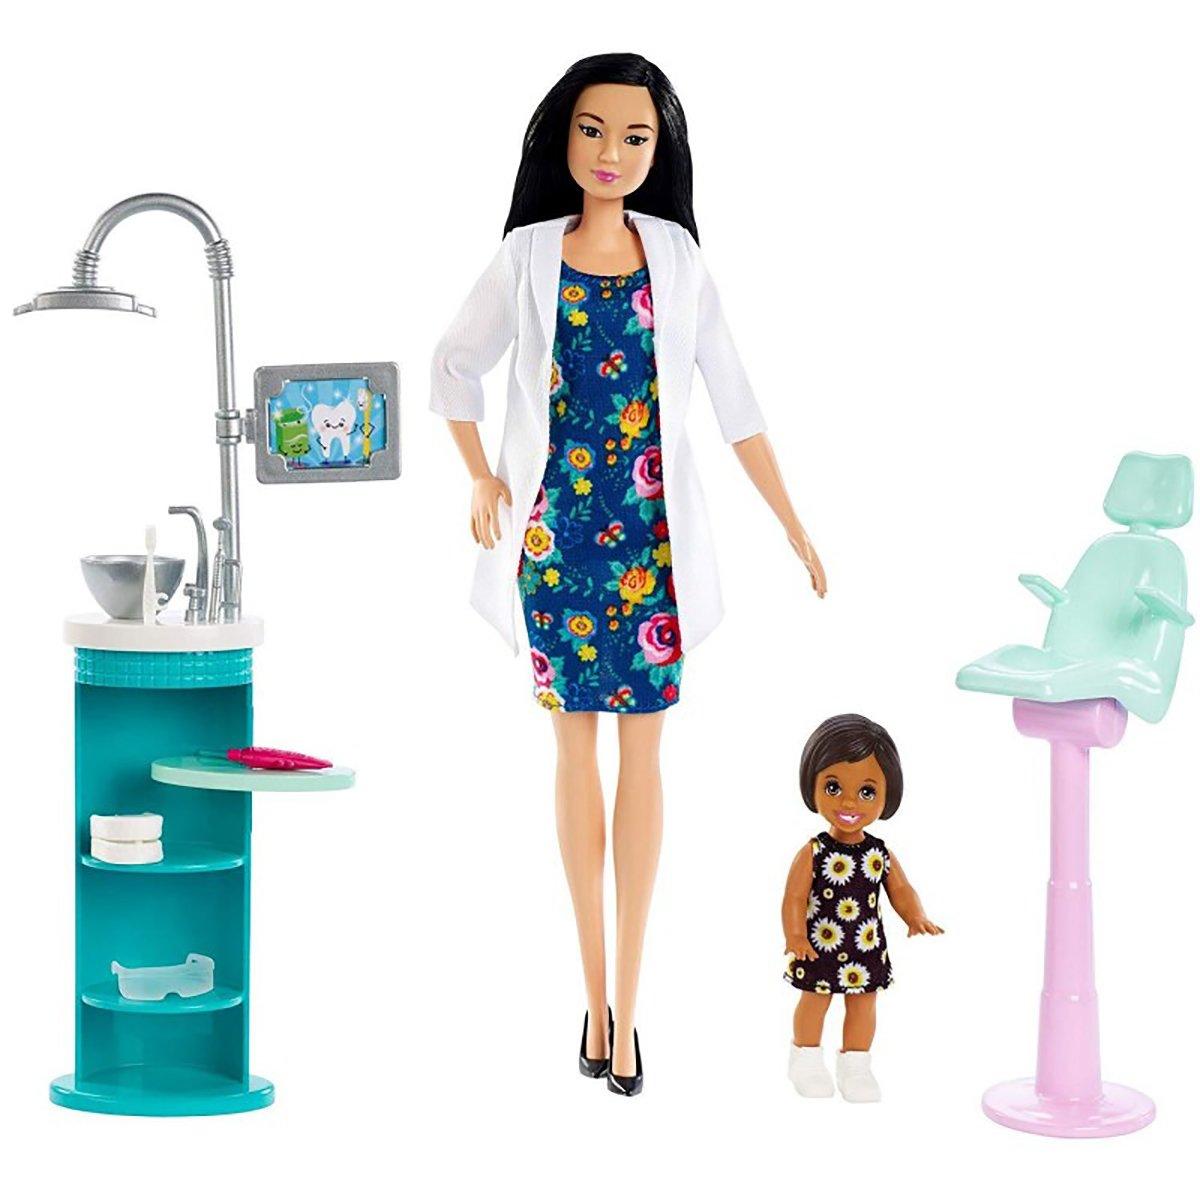 Set de joaca Barbie, Doctor dentist, FXP17 imagine